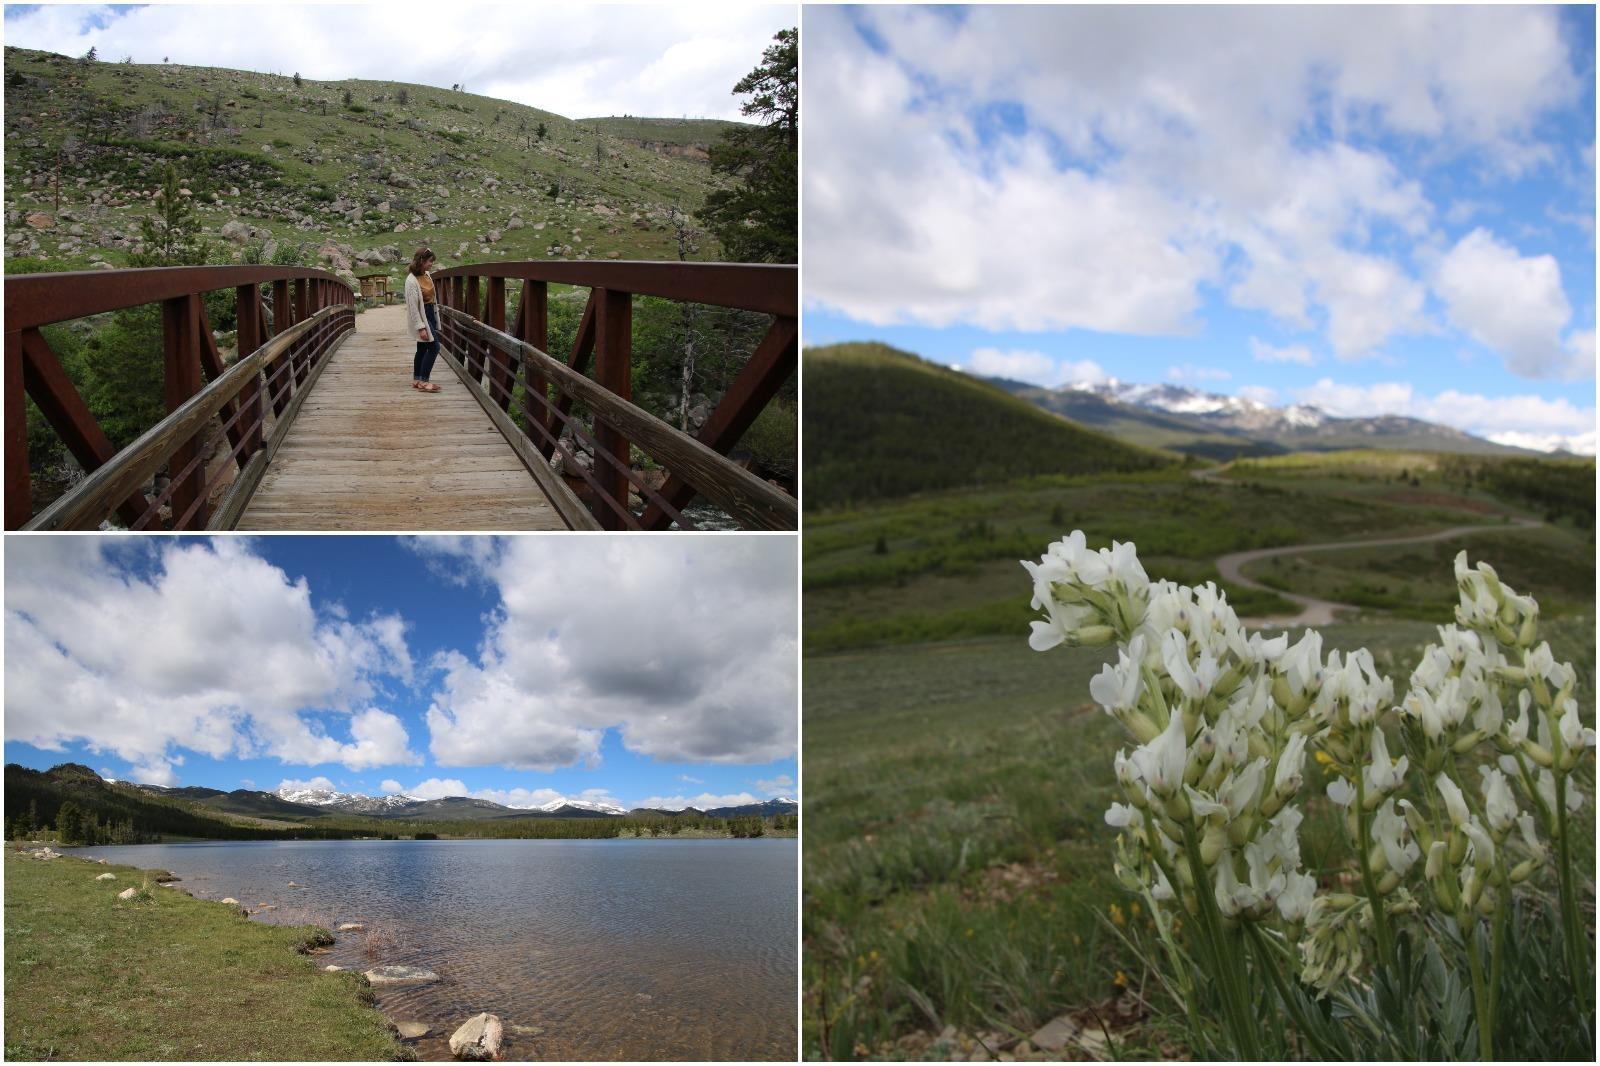 Enjoy hiking around the alpine lakes on the Loop Road in Wyoming